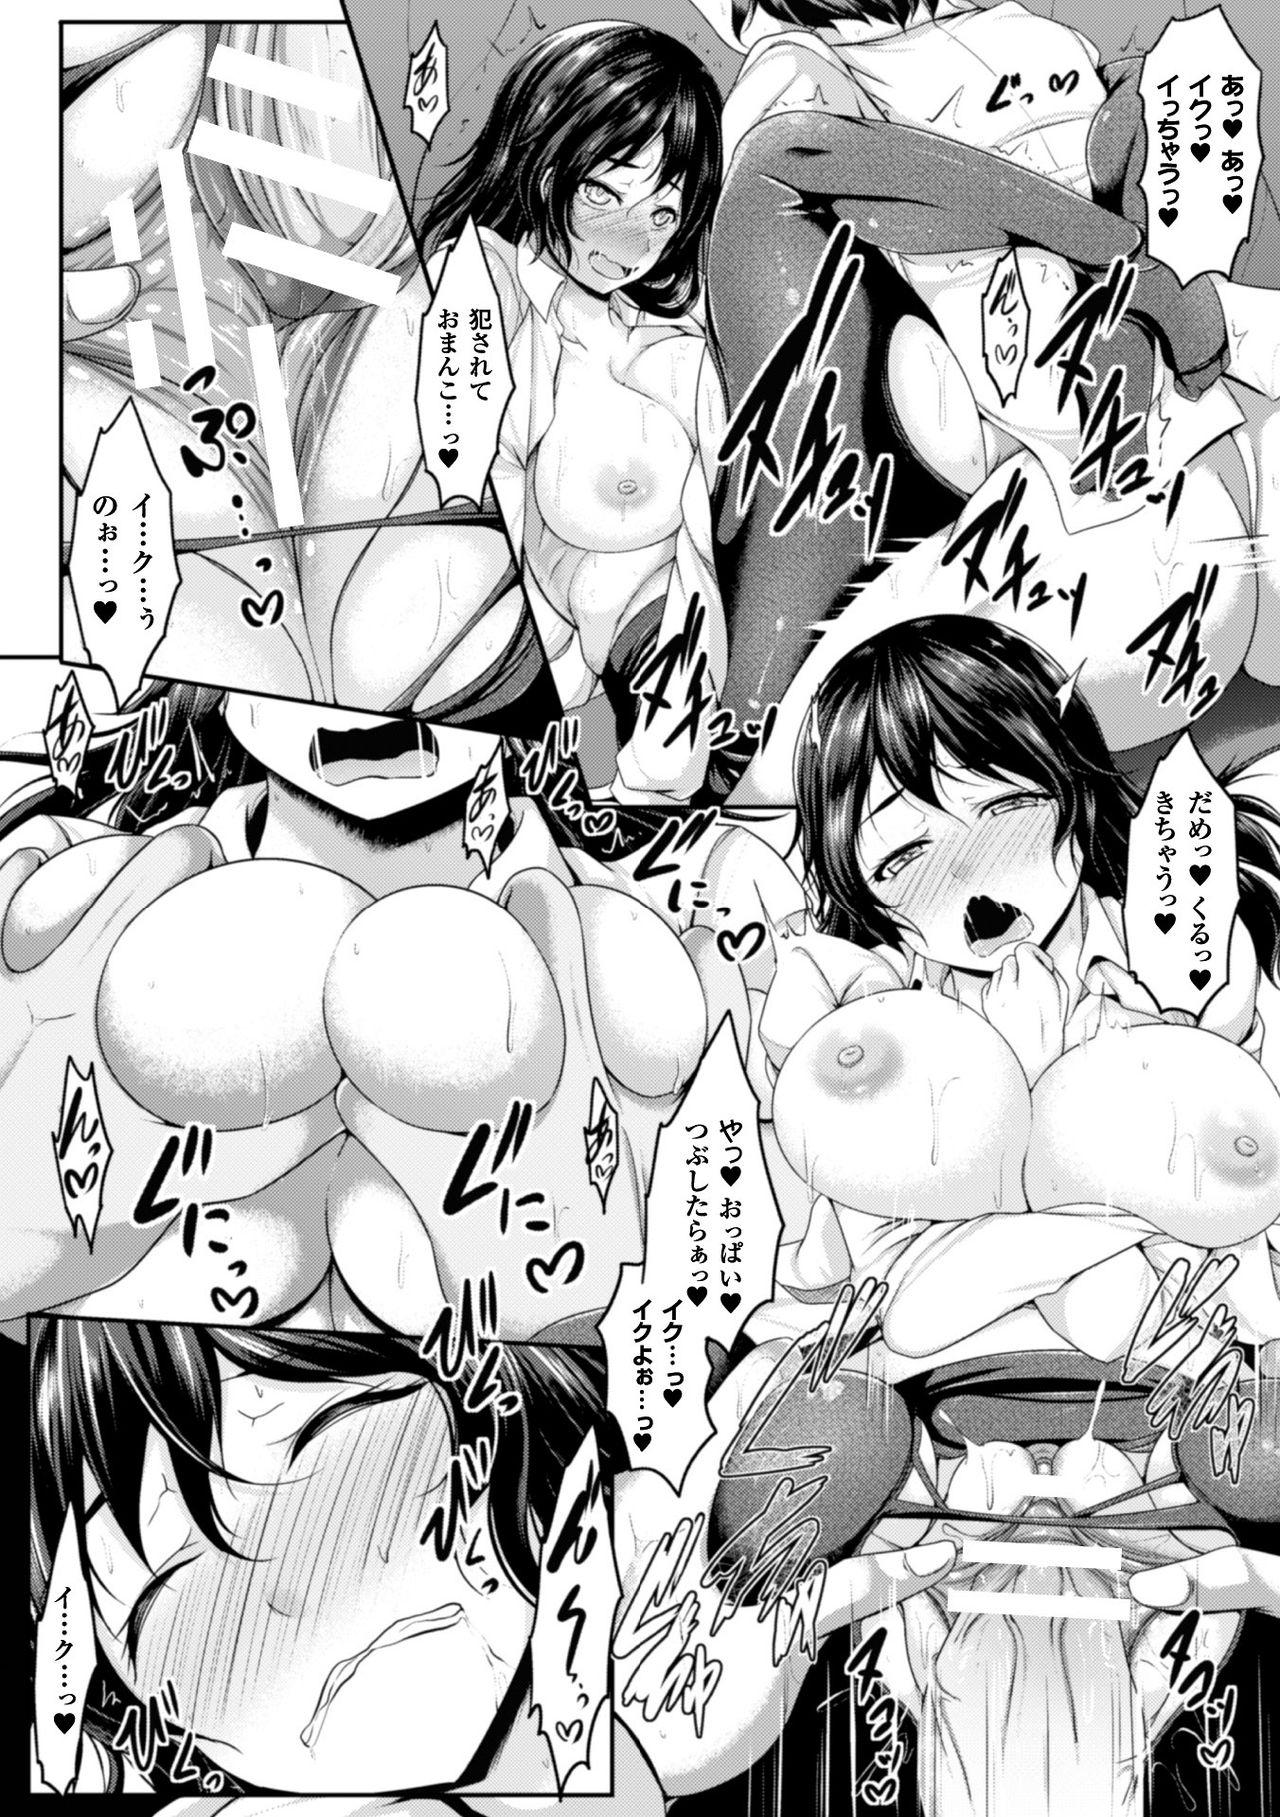 2D Comic Magazine TS Jibun Heroine mou Hitori no Ore ga Erosugite Gaman Dekinee! Vol. 1 59